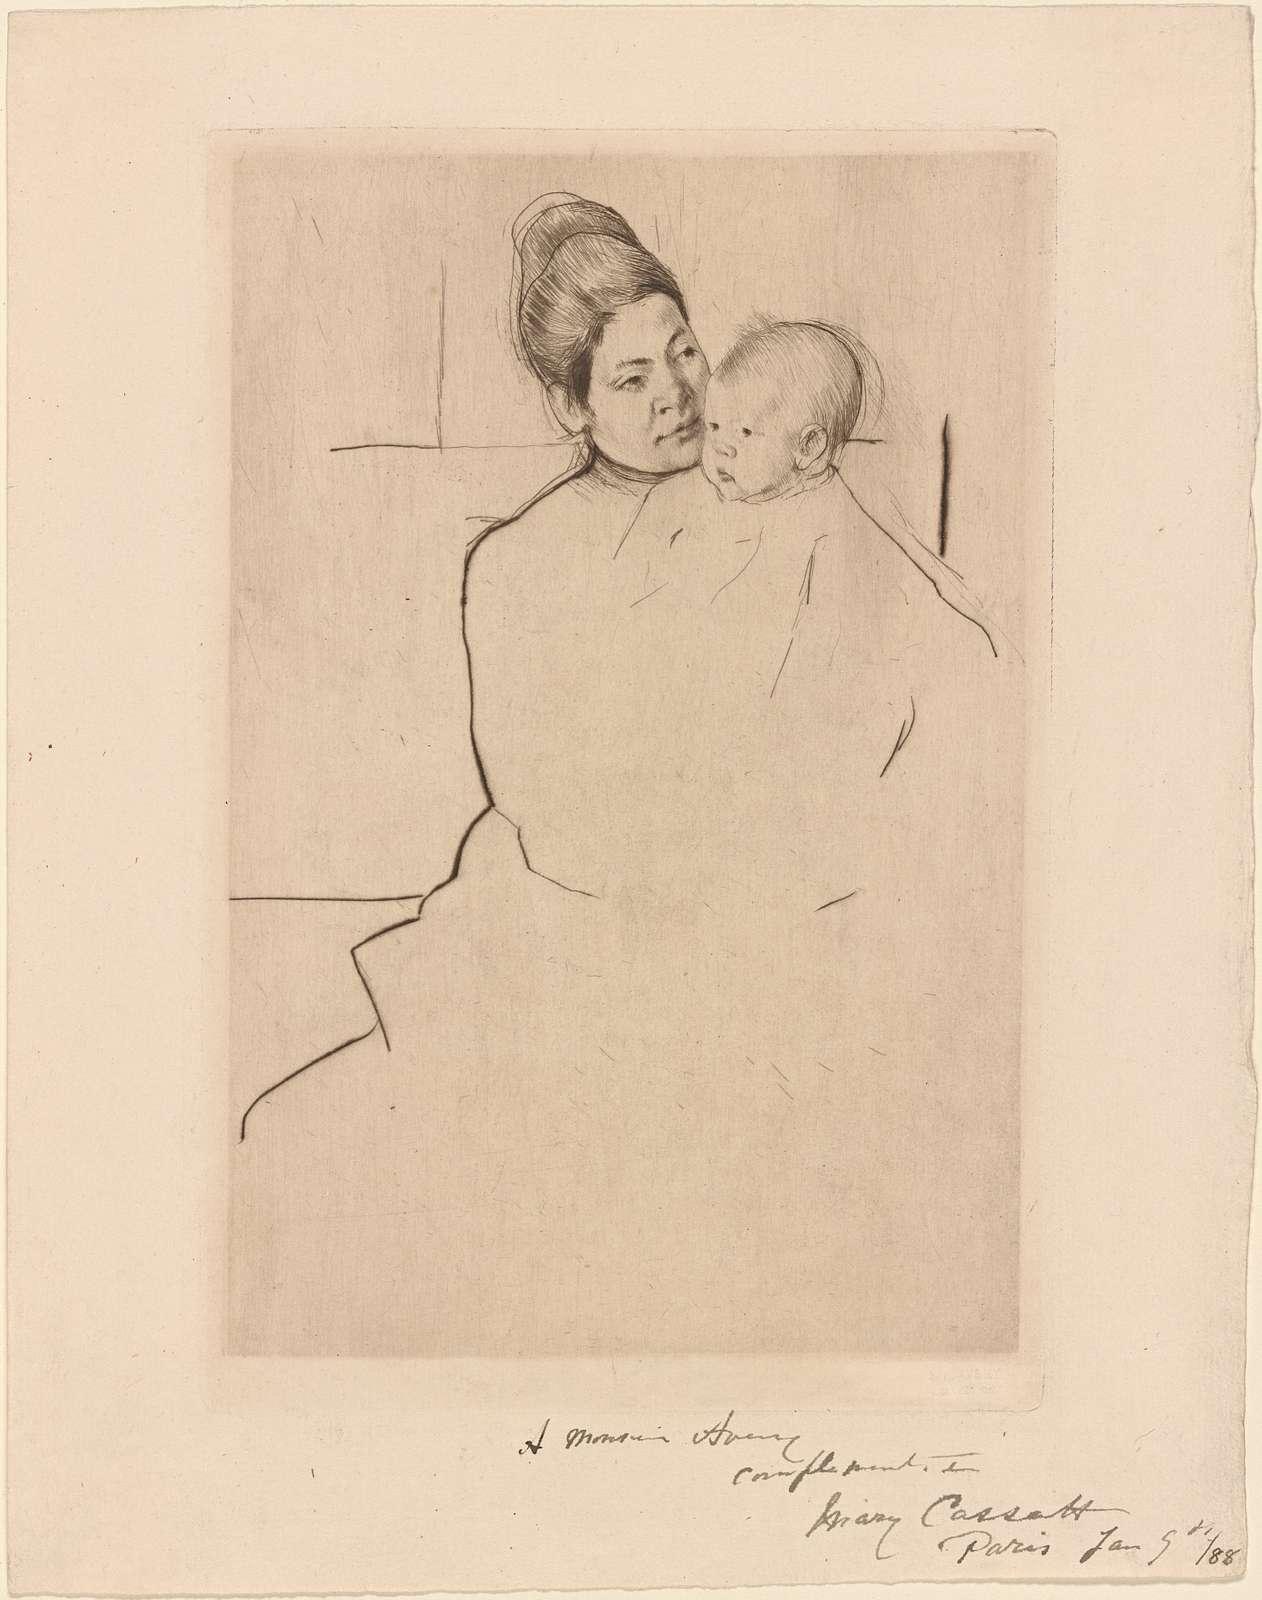 Gardner held by his mother.